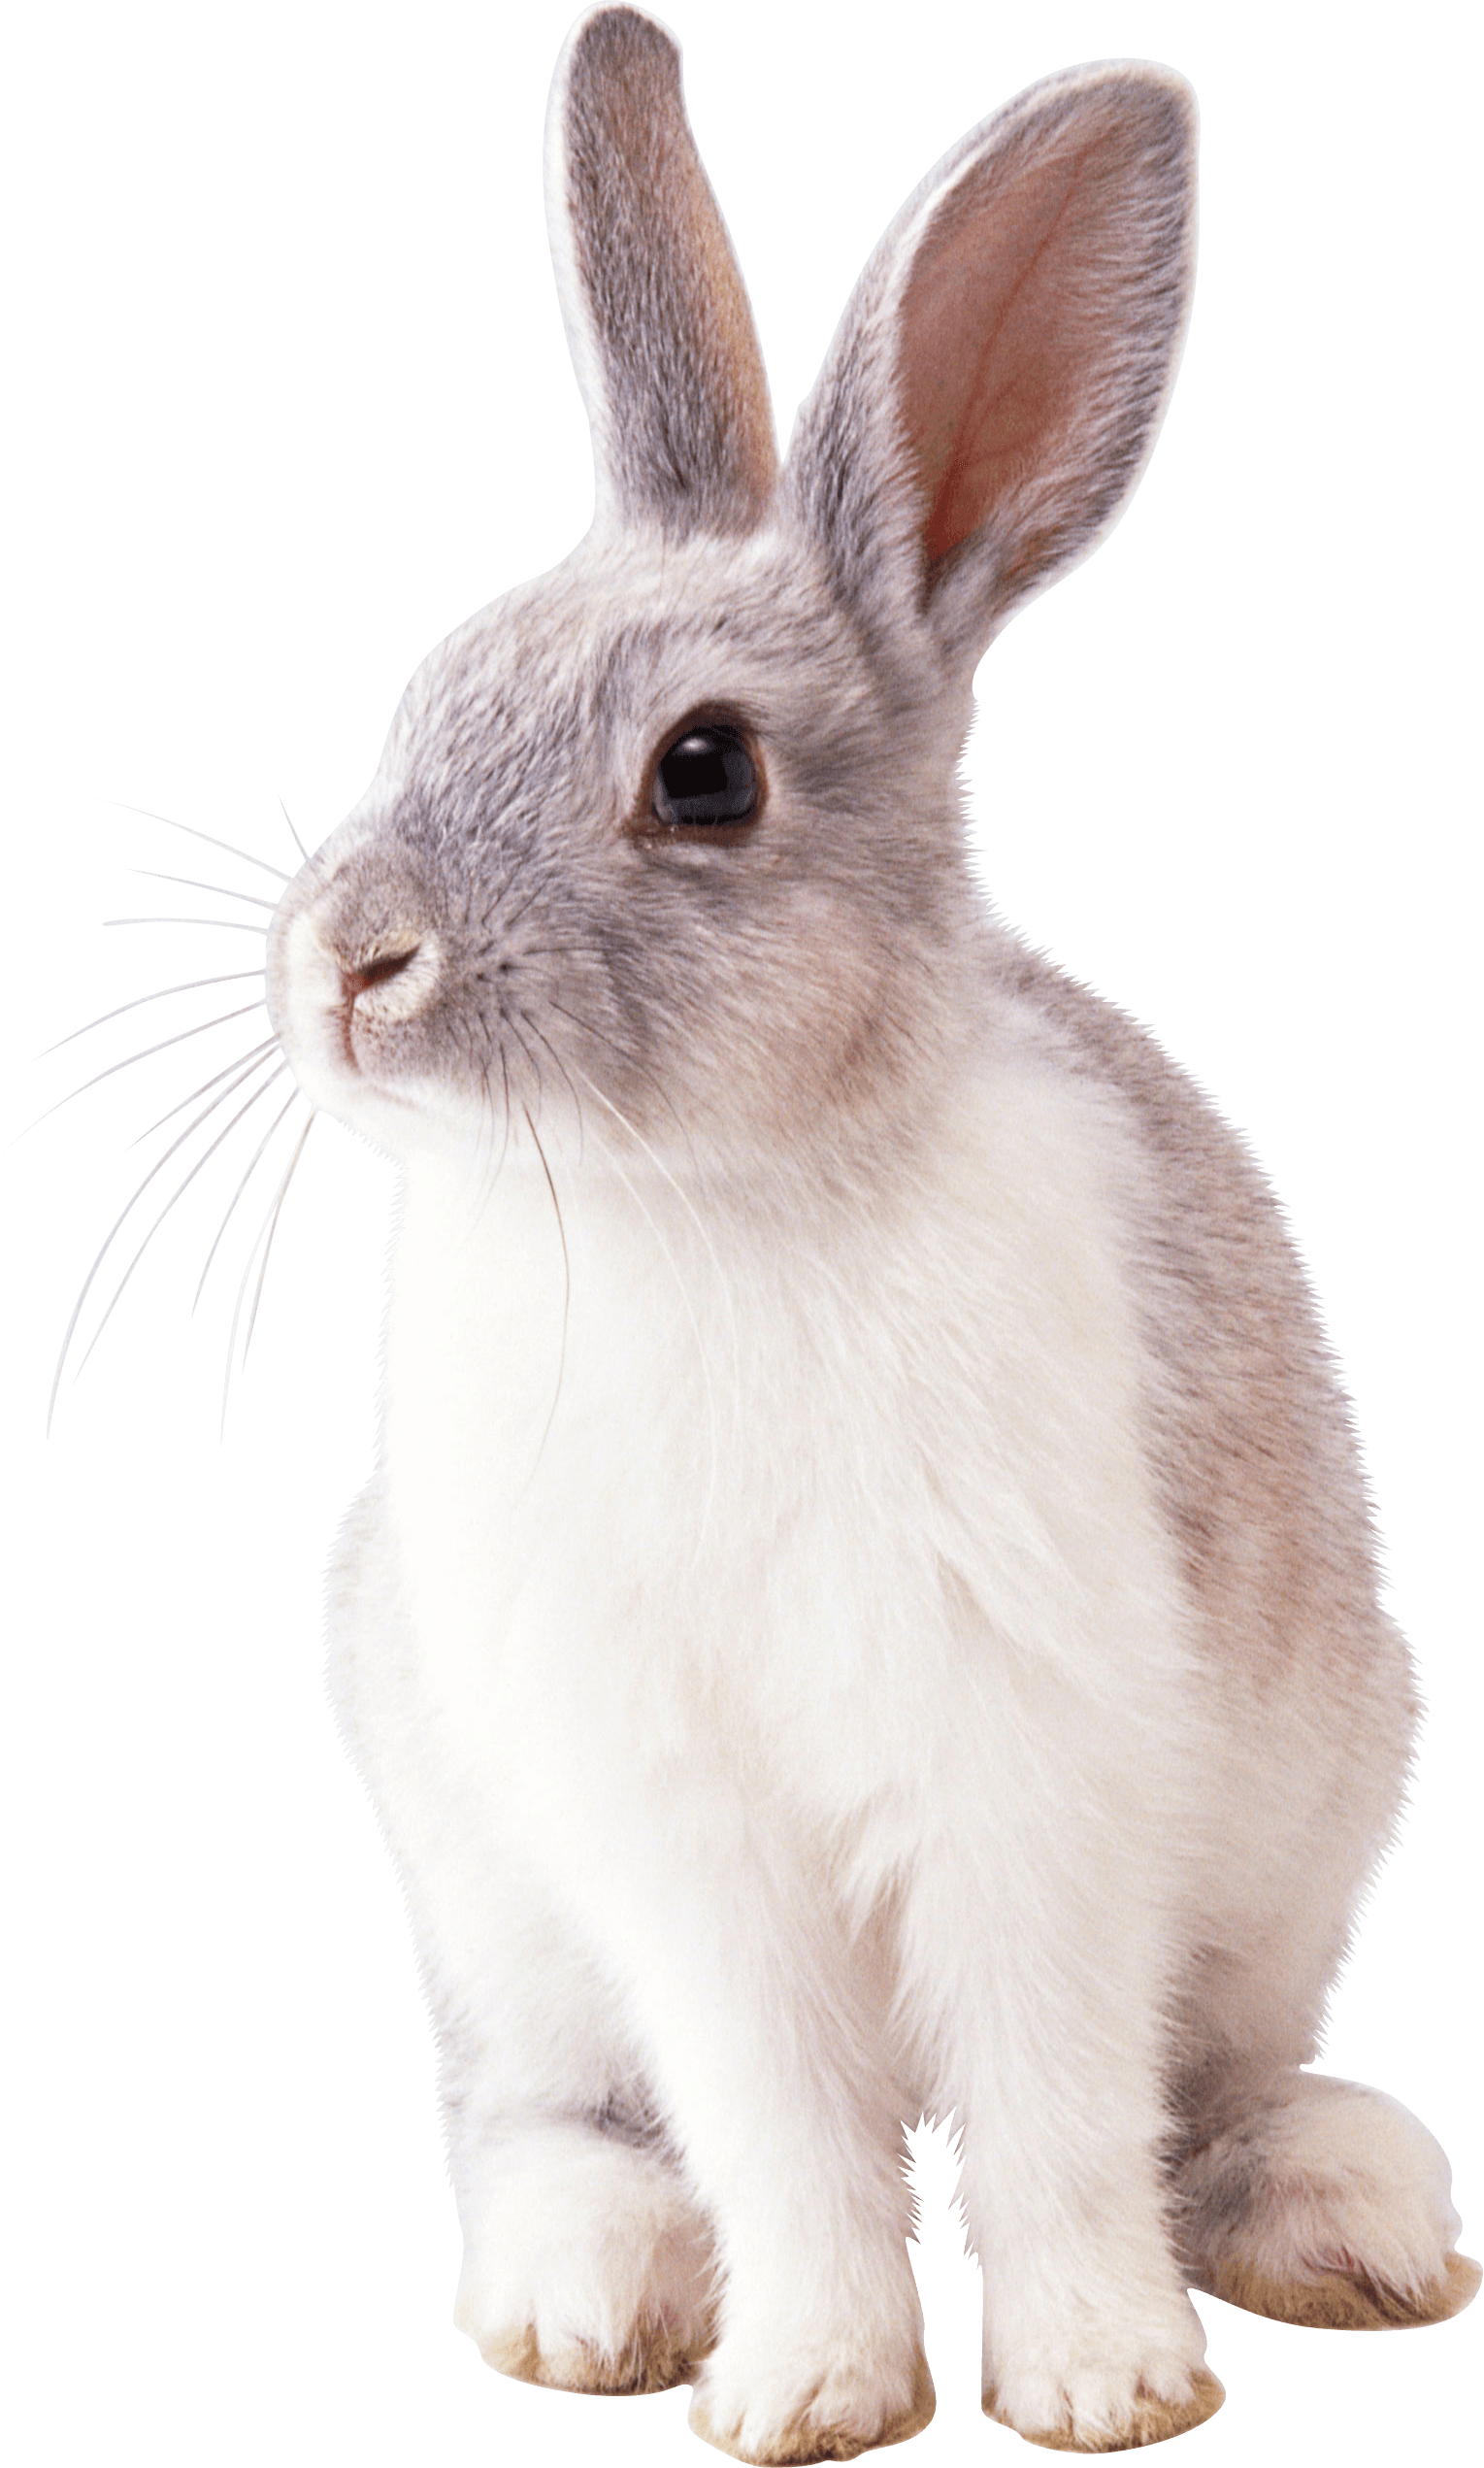 Cottontail rabbit Easter Bunny Clip art.